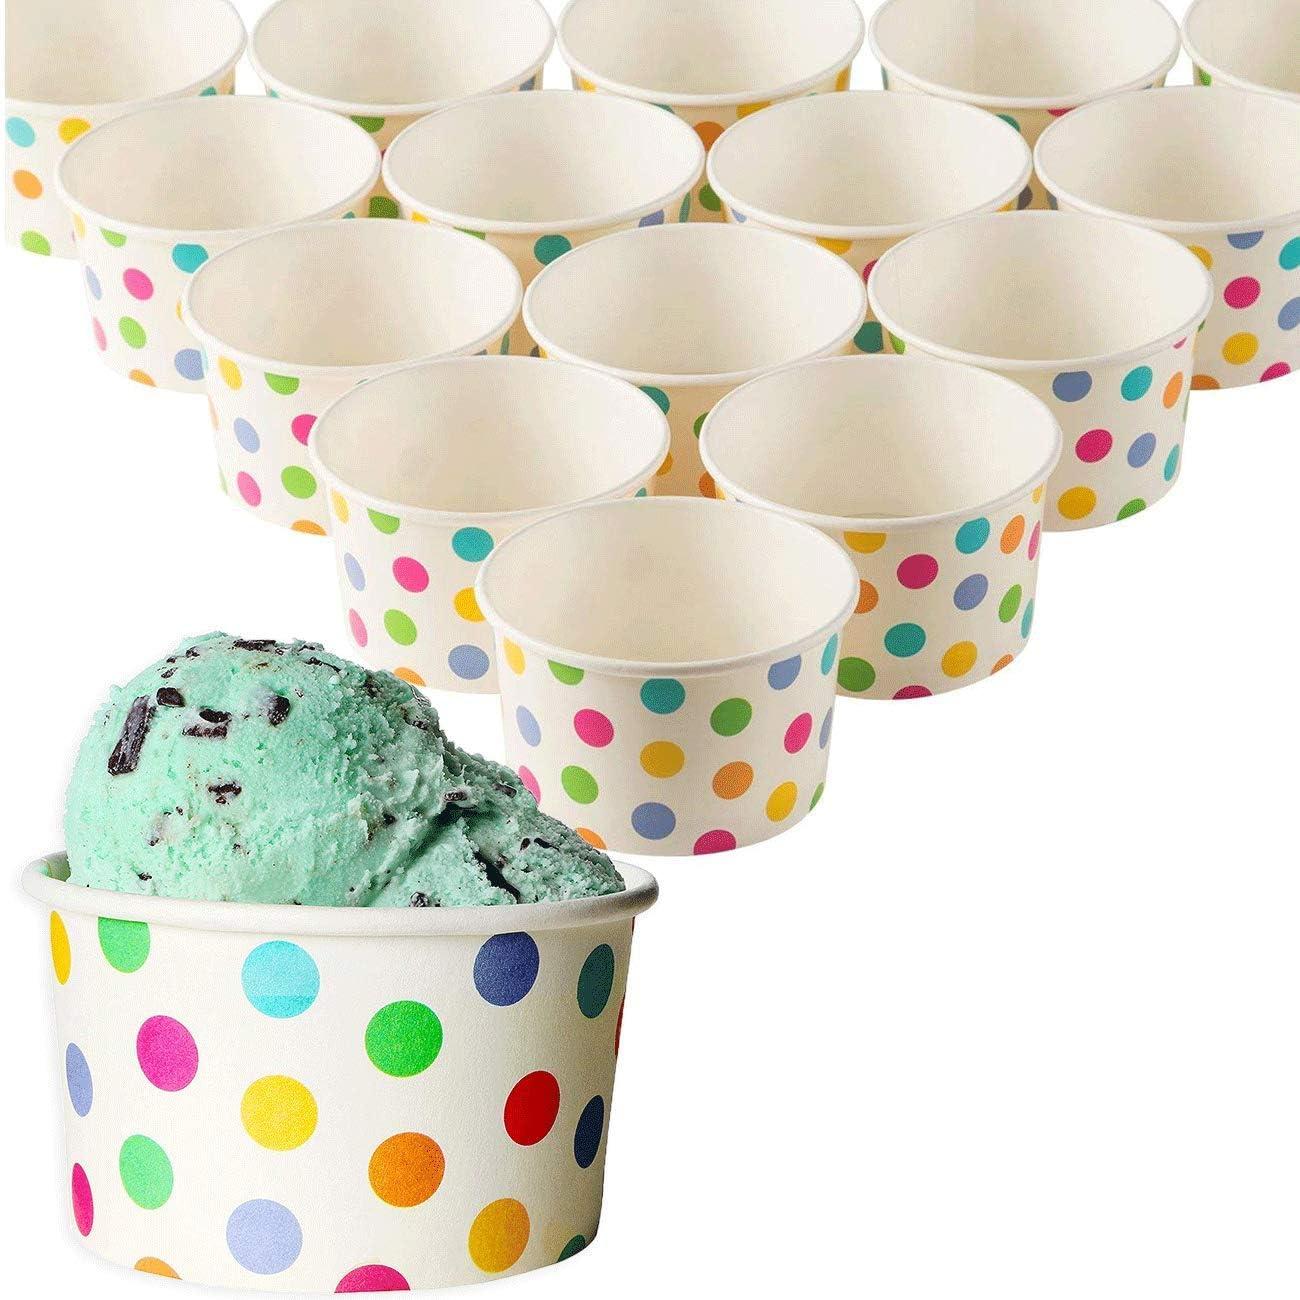 Juvale 50-Count Paper Ice Cream Sundae Cups, Yogurt Dessert Bowls, Rainbow Polka Dots Party Supplies, 8-Ounces